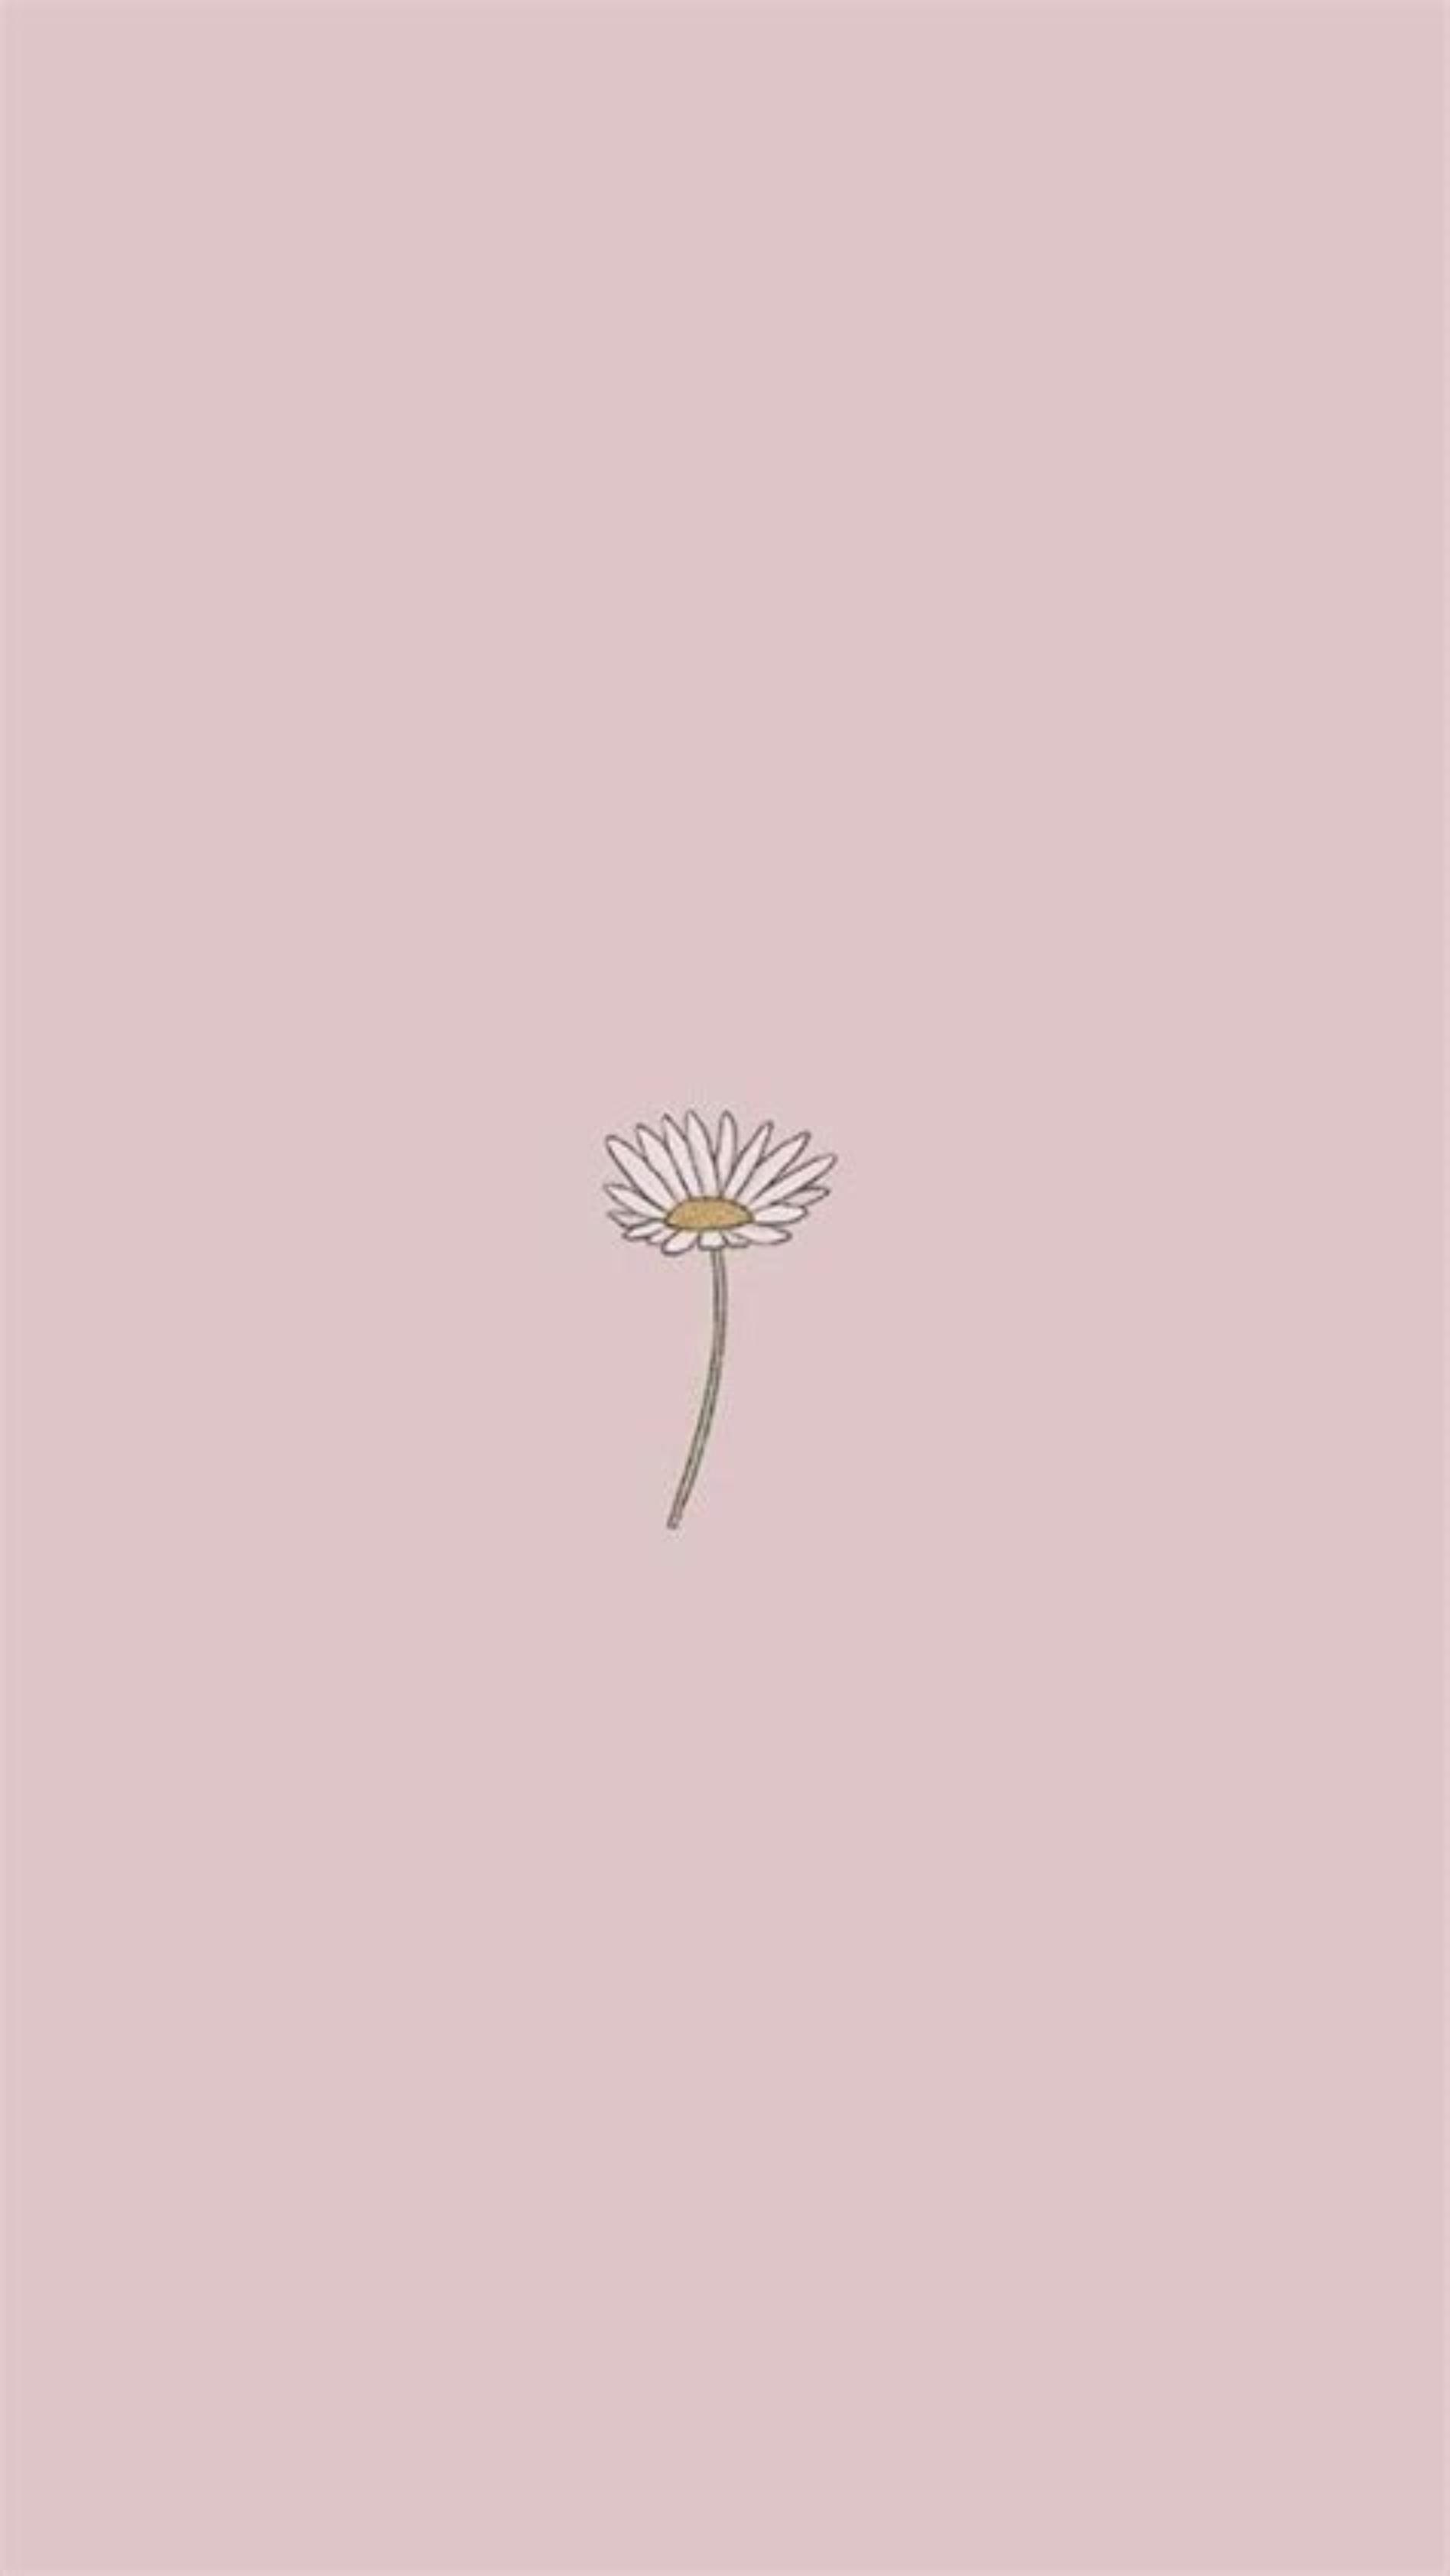 70 Best Simple Aesthetic Wallpaper Hd 2021wallpaper Iphone Aesthetic Pictures Wallpaper In 2021 Floral Wallpaper Phone Tumblr Iphone Wallpaper Pretty Wallpaper Iphone